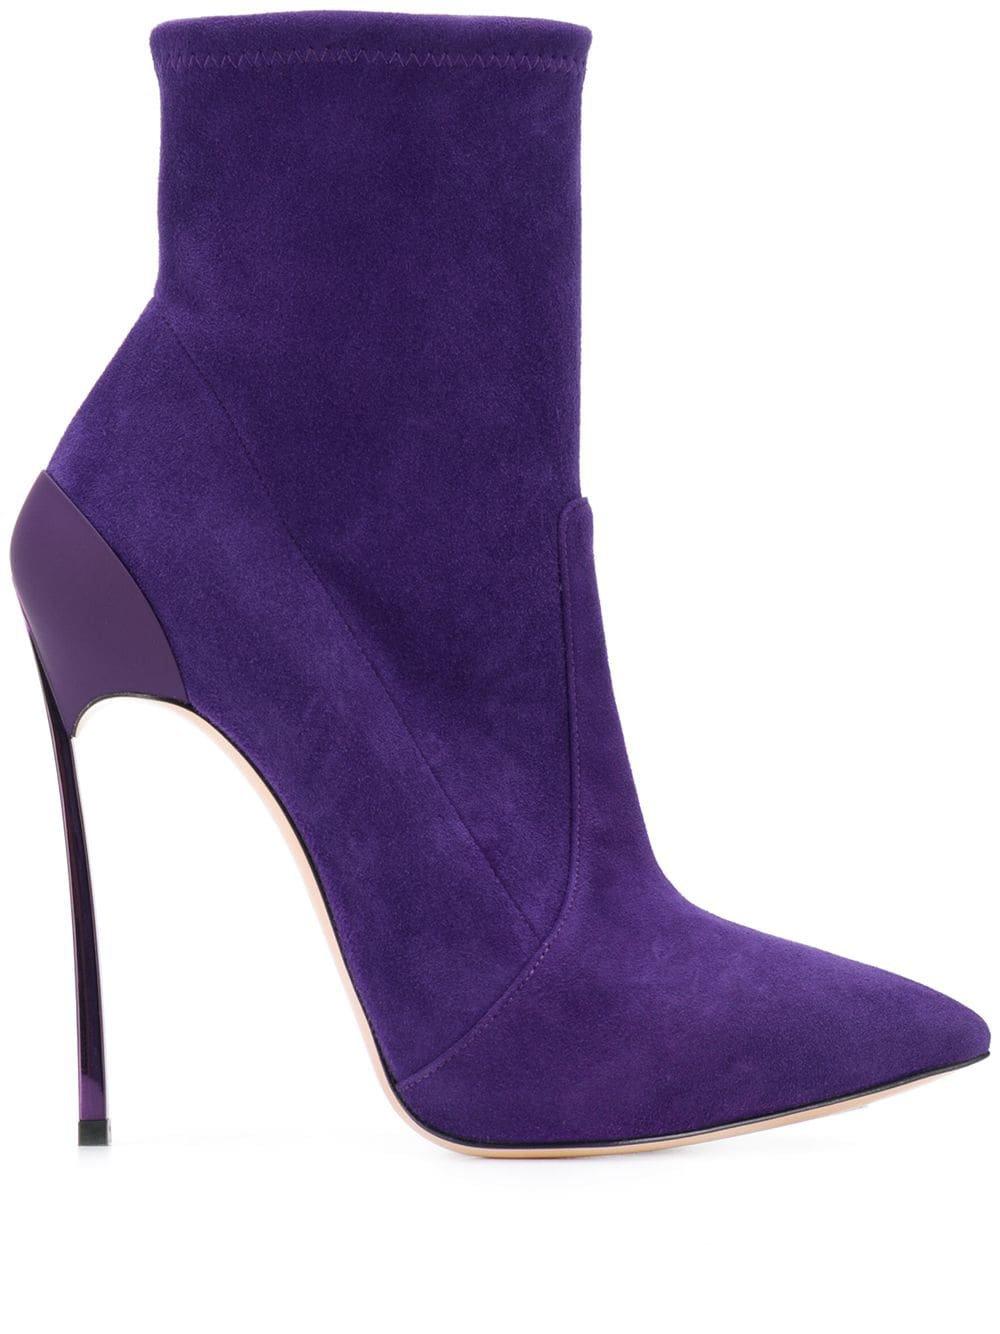 Casadei High Heel Sock Boots